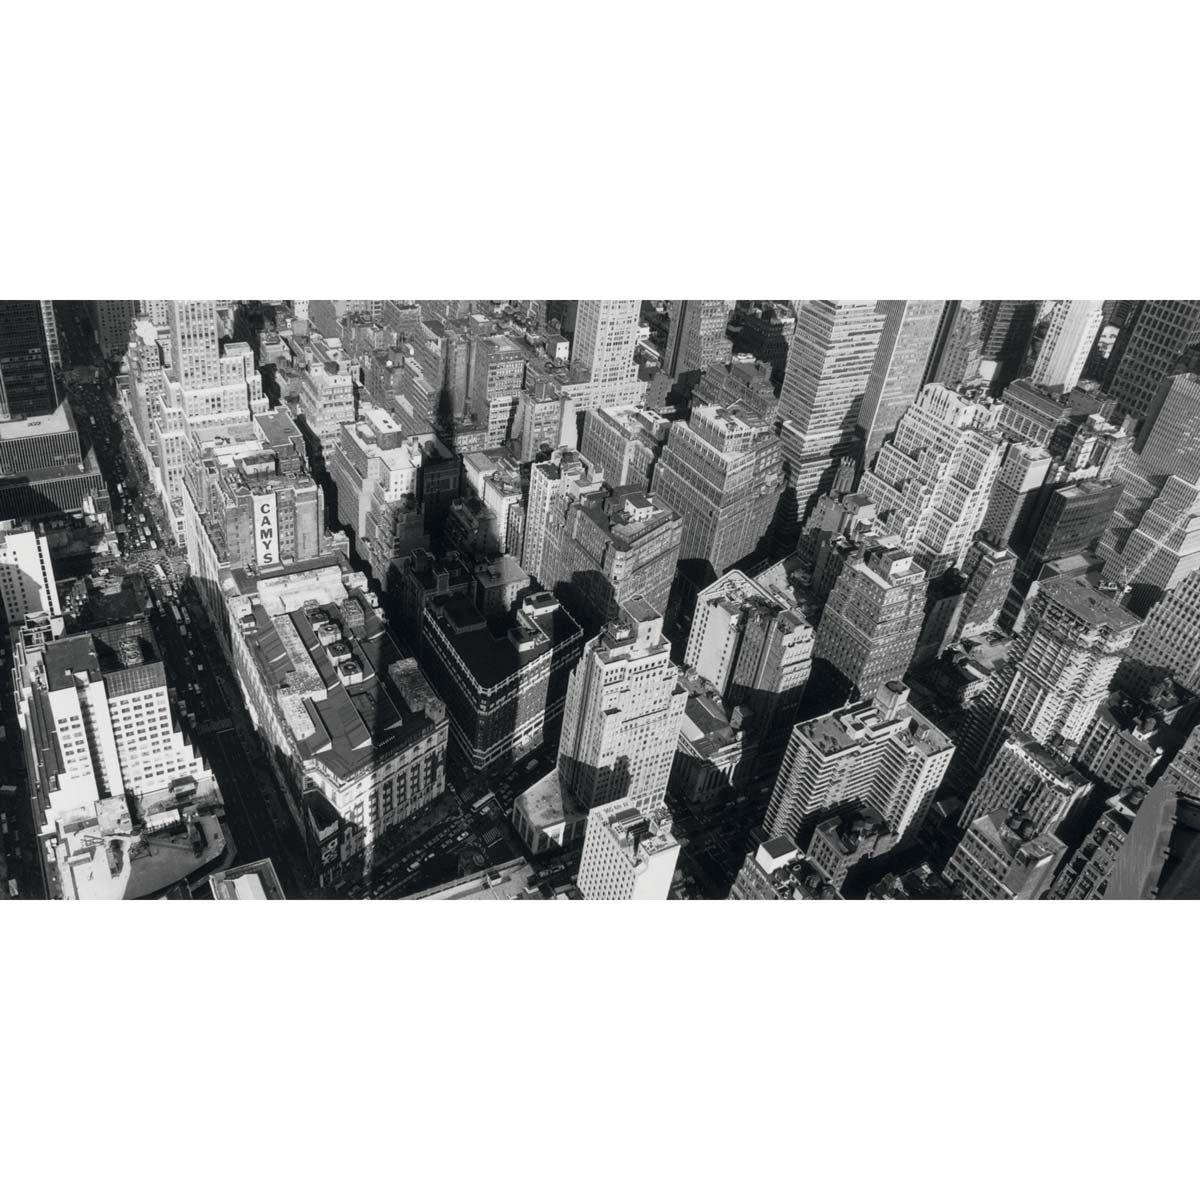 Affiche Vue de l Empire State Building, New York, Torsten